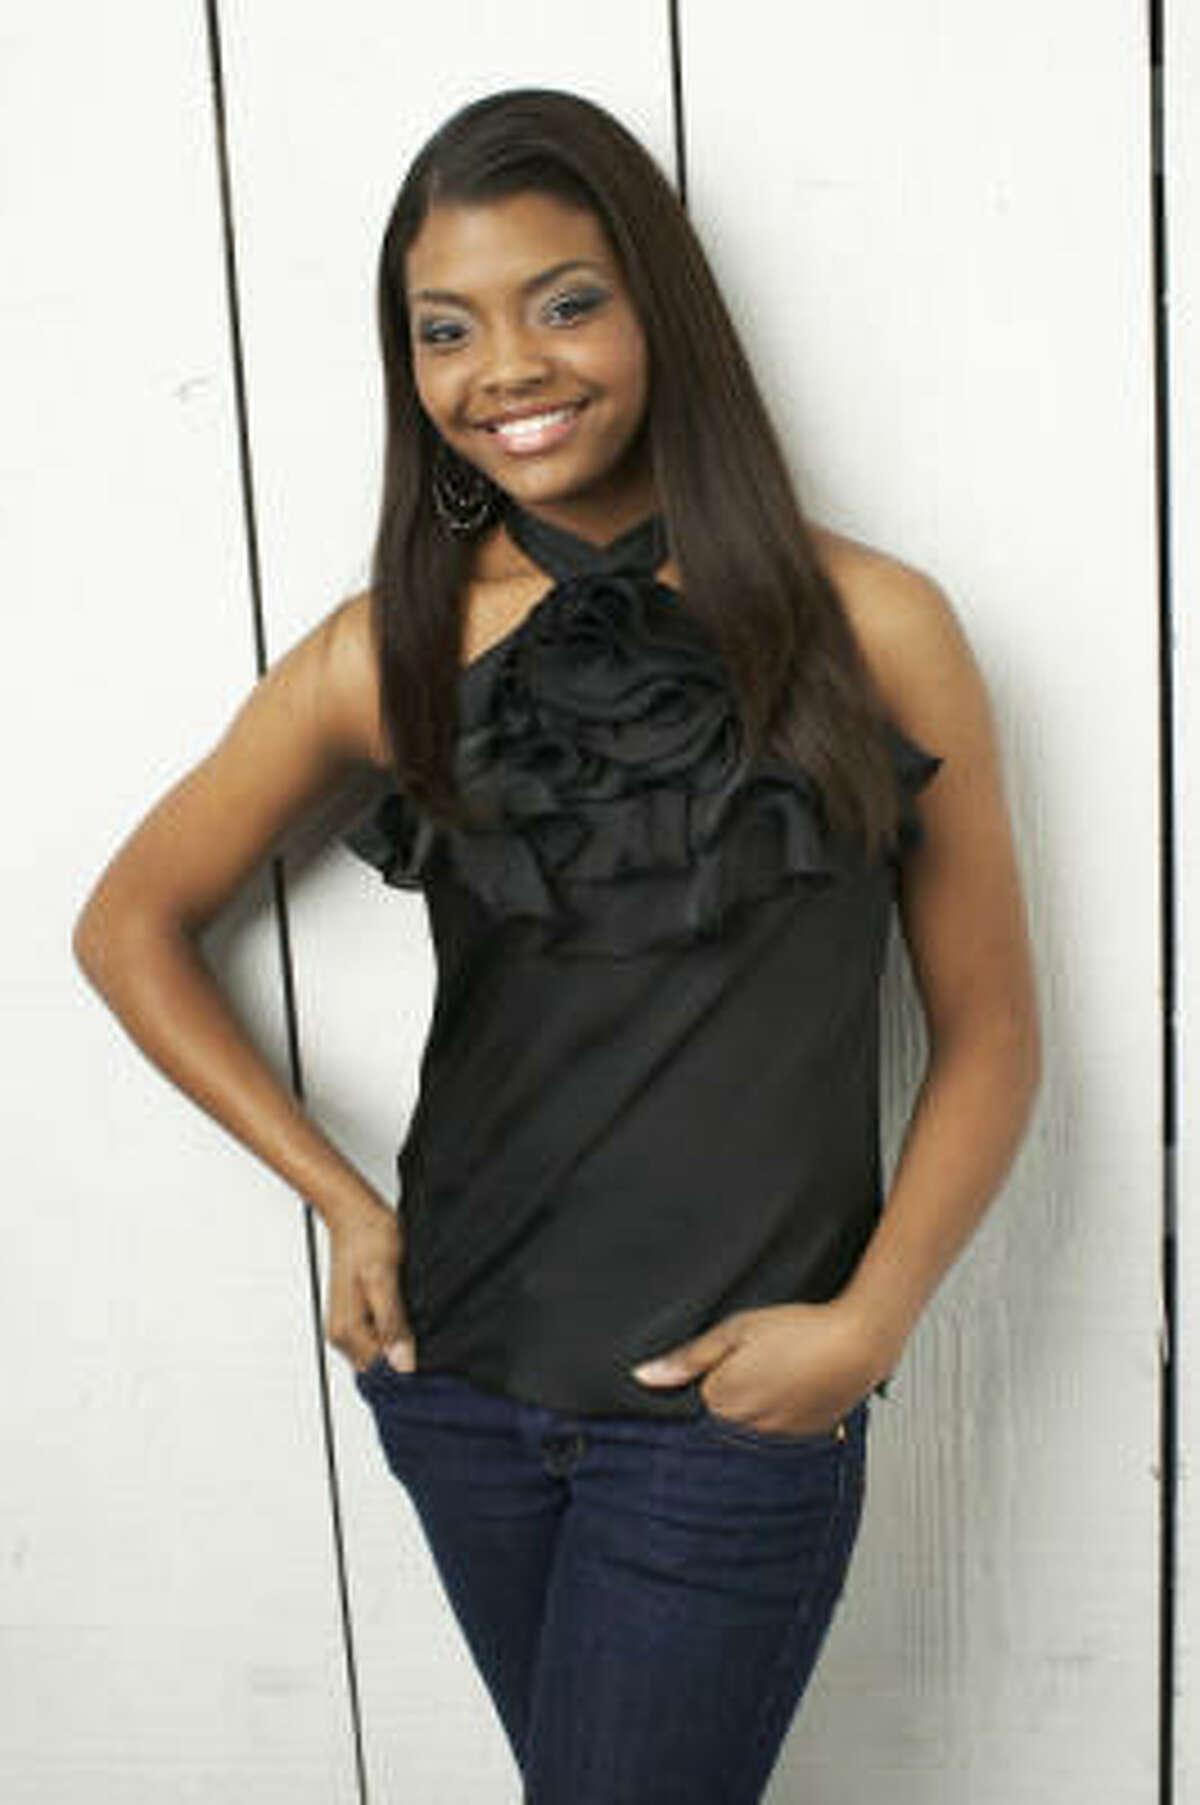 Jasmine Murray - Hometown: Columbus, MS. Age: 17